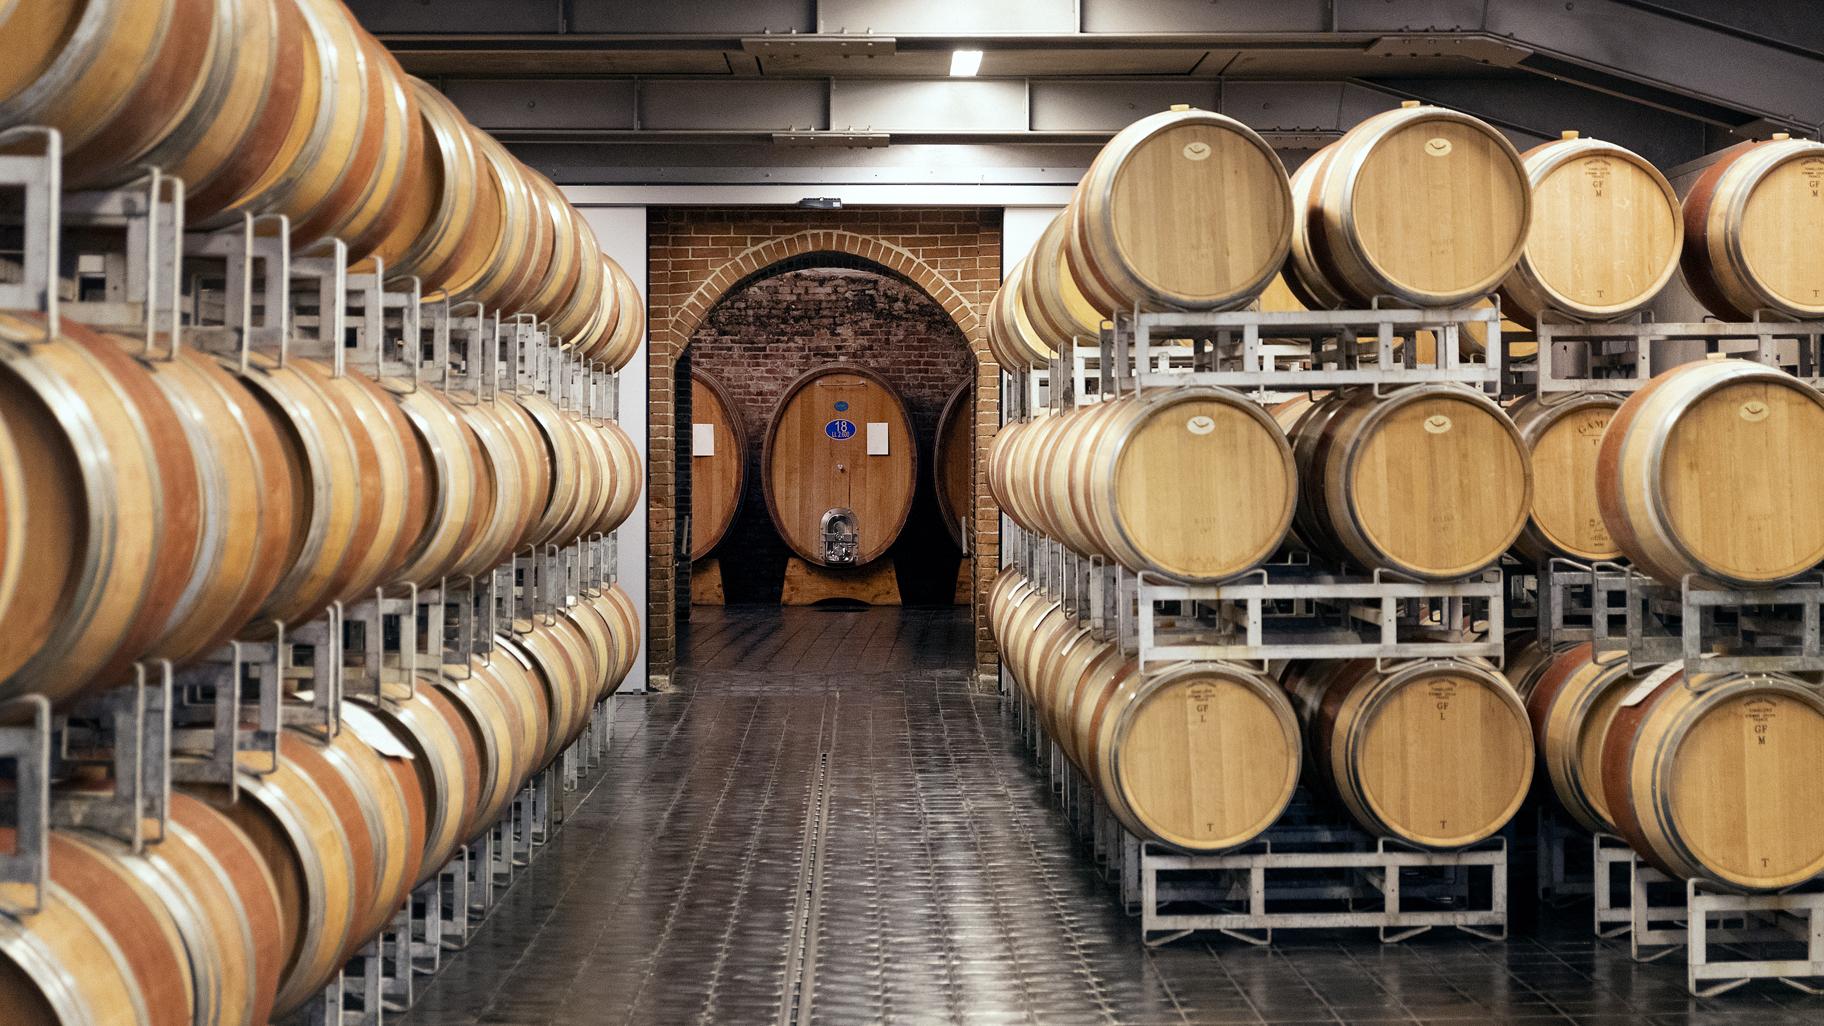 Gaja winery